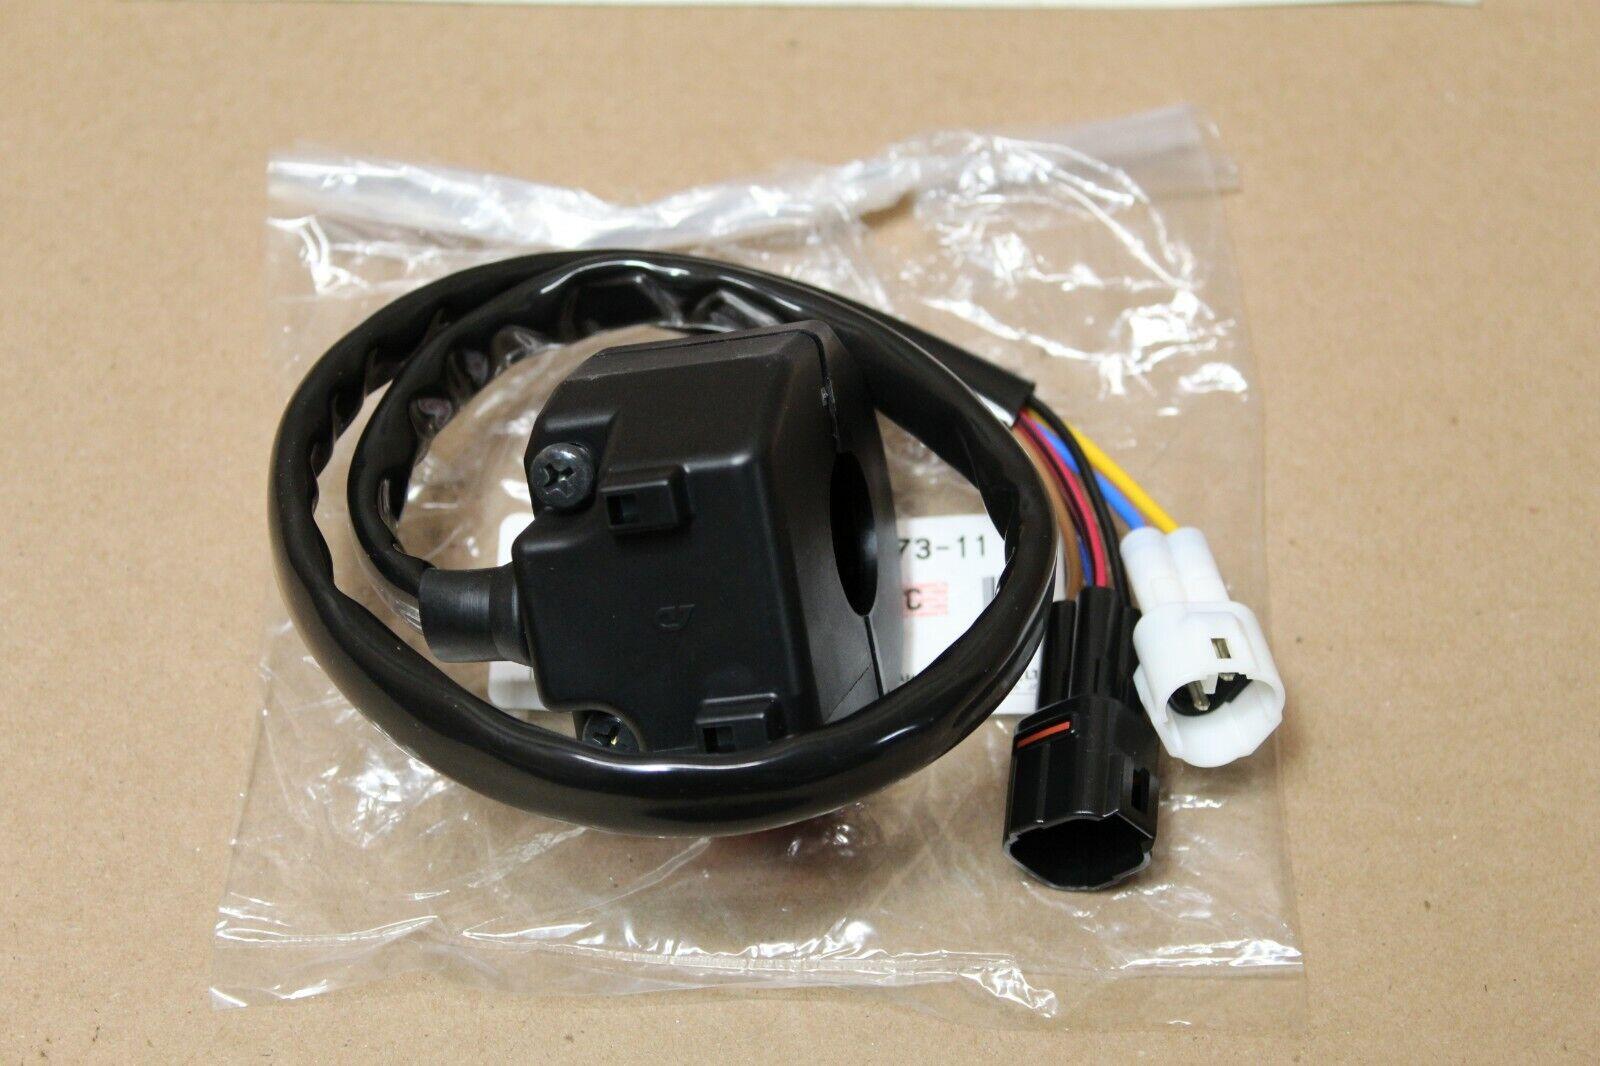 off kill switch FAST SHIPPING 06-18 Yamaha Raptor 700 Headlight Switch on